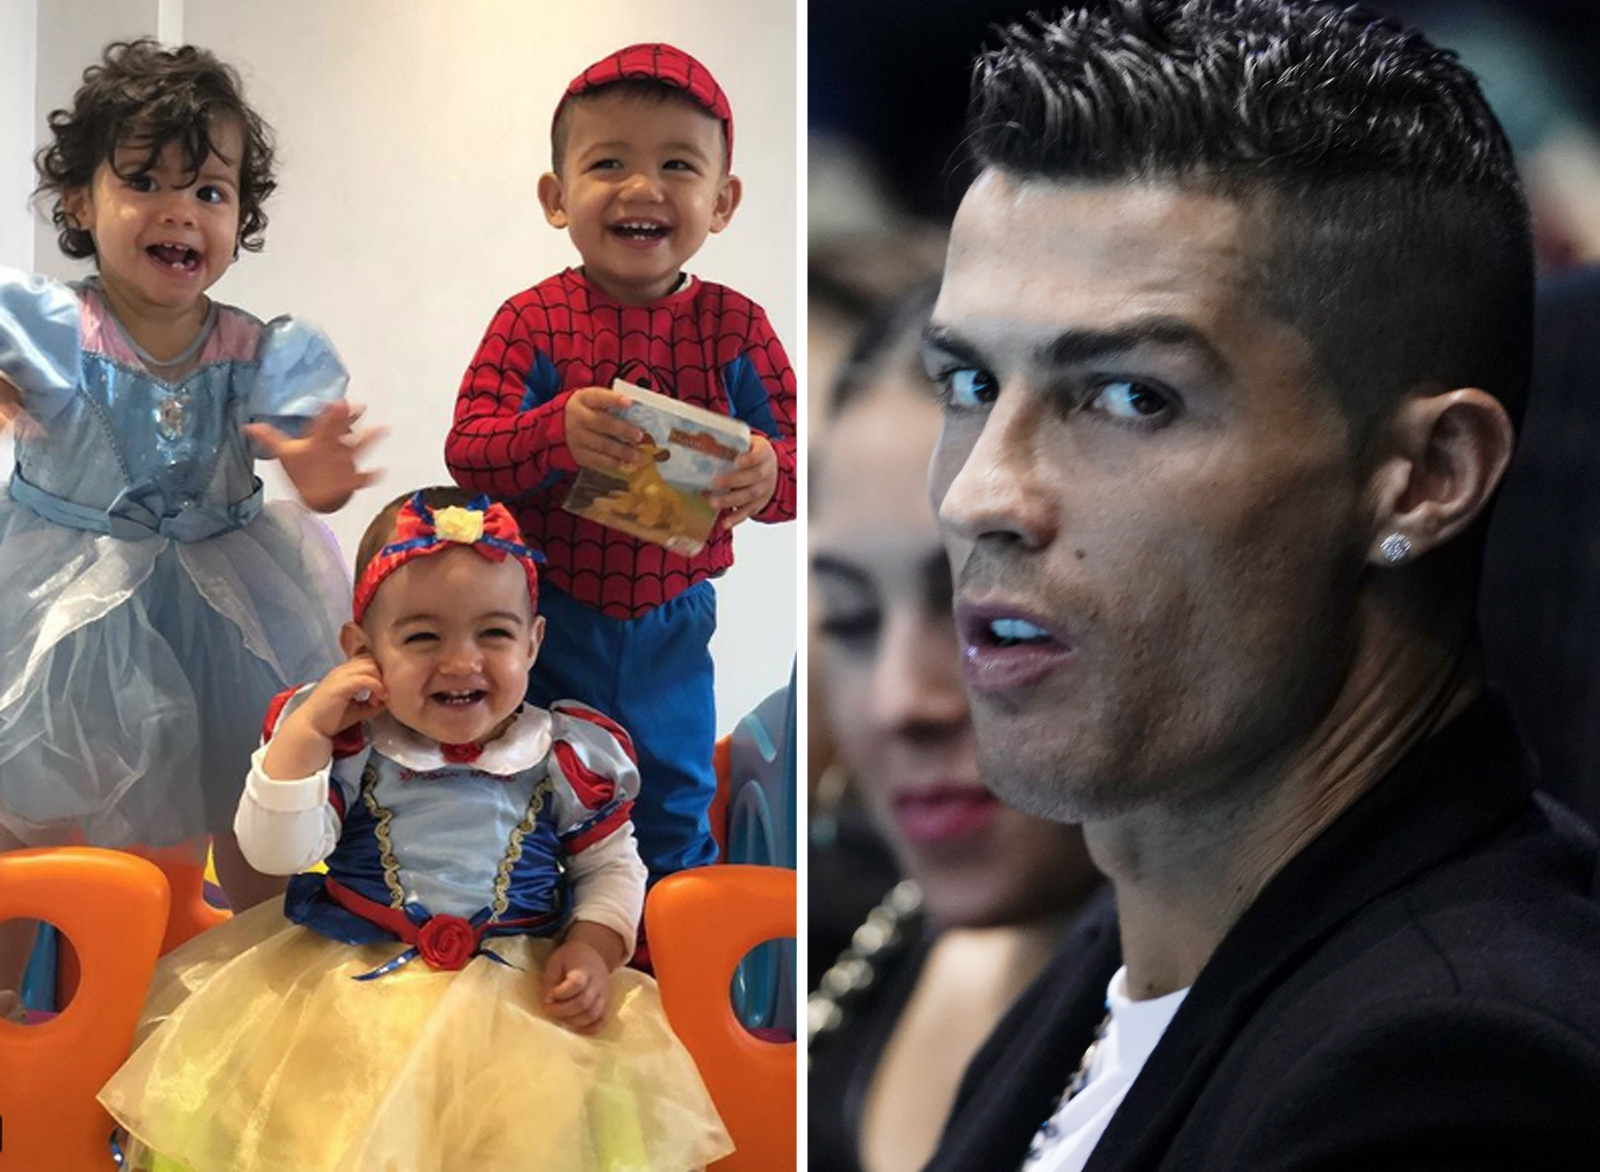 Alana Martina Mateo Eva Cristiano Ronaldo